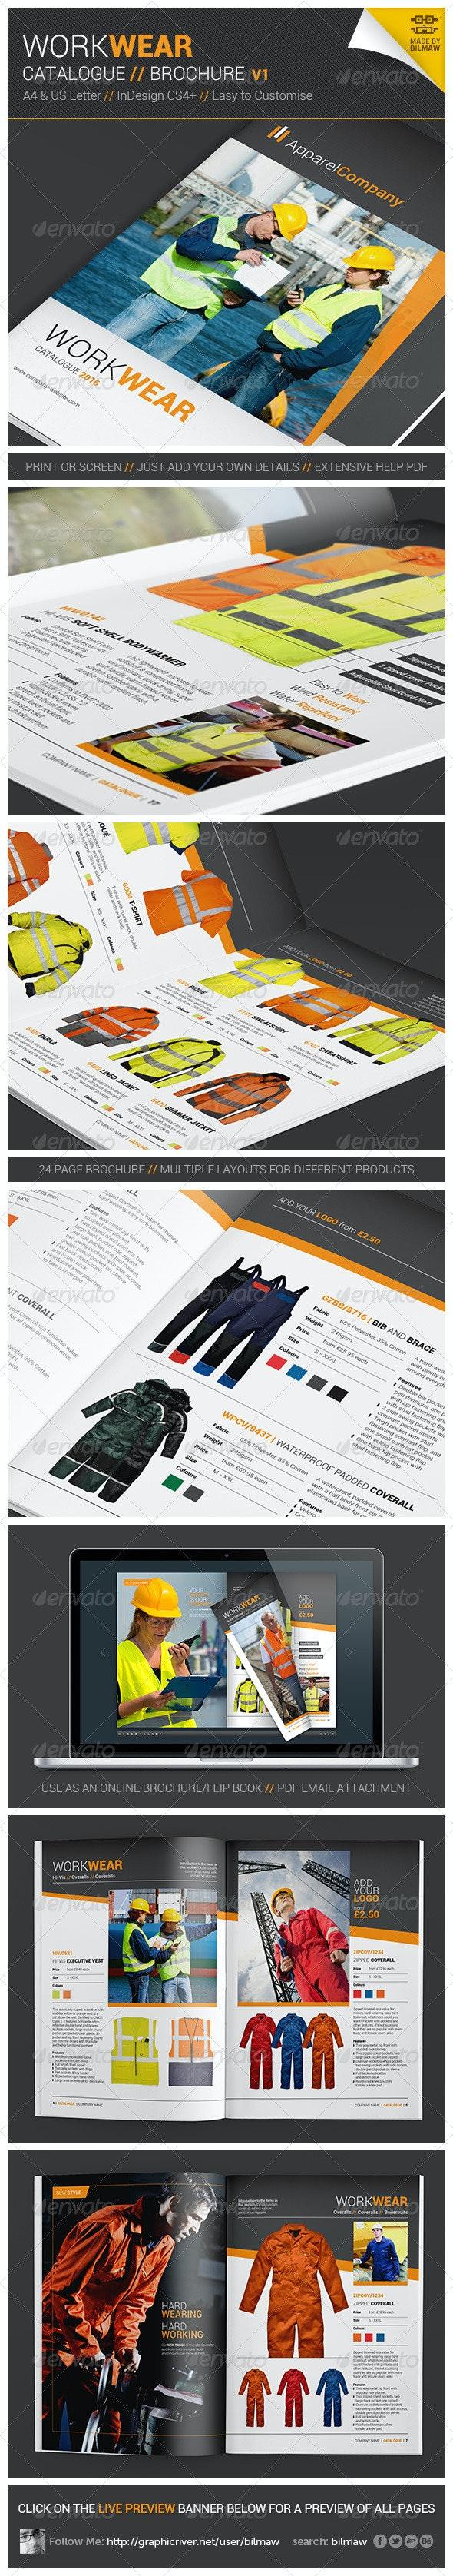 Workwear Catalogue/Brochure V1 - Catalogs Brochures